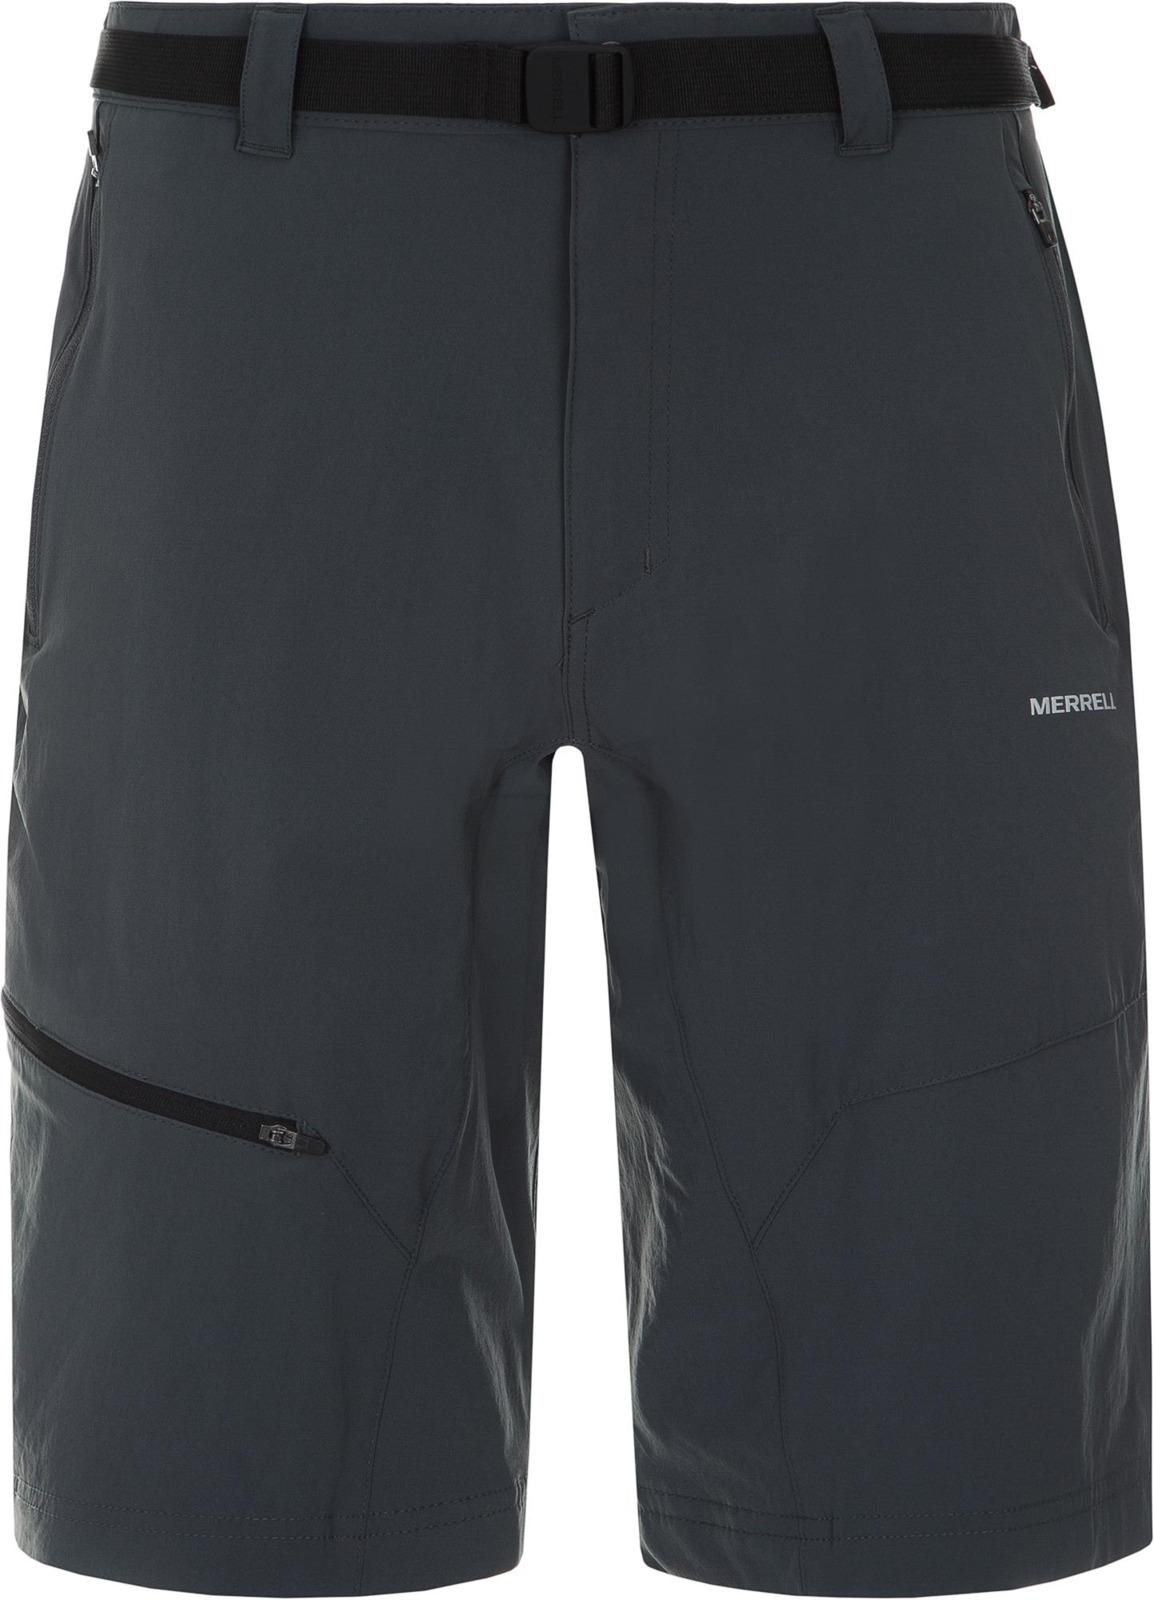 Шорты Merrell шорты мужские merrell men s shorts цвет петроль s19amrshm01 s3 размер 48